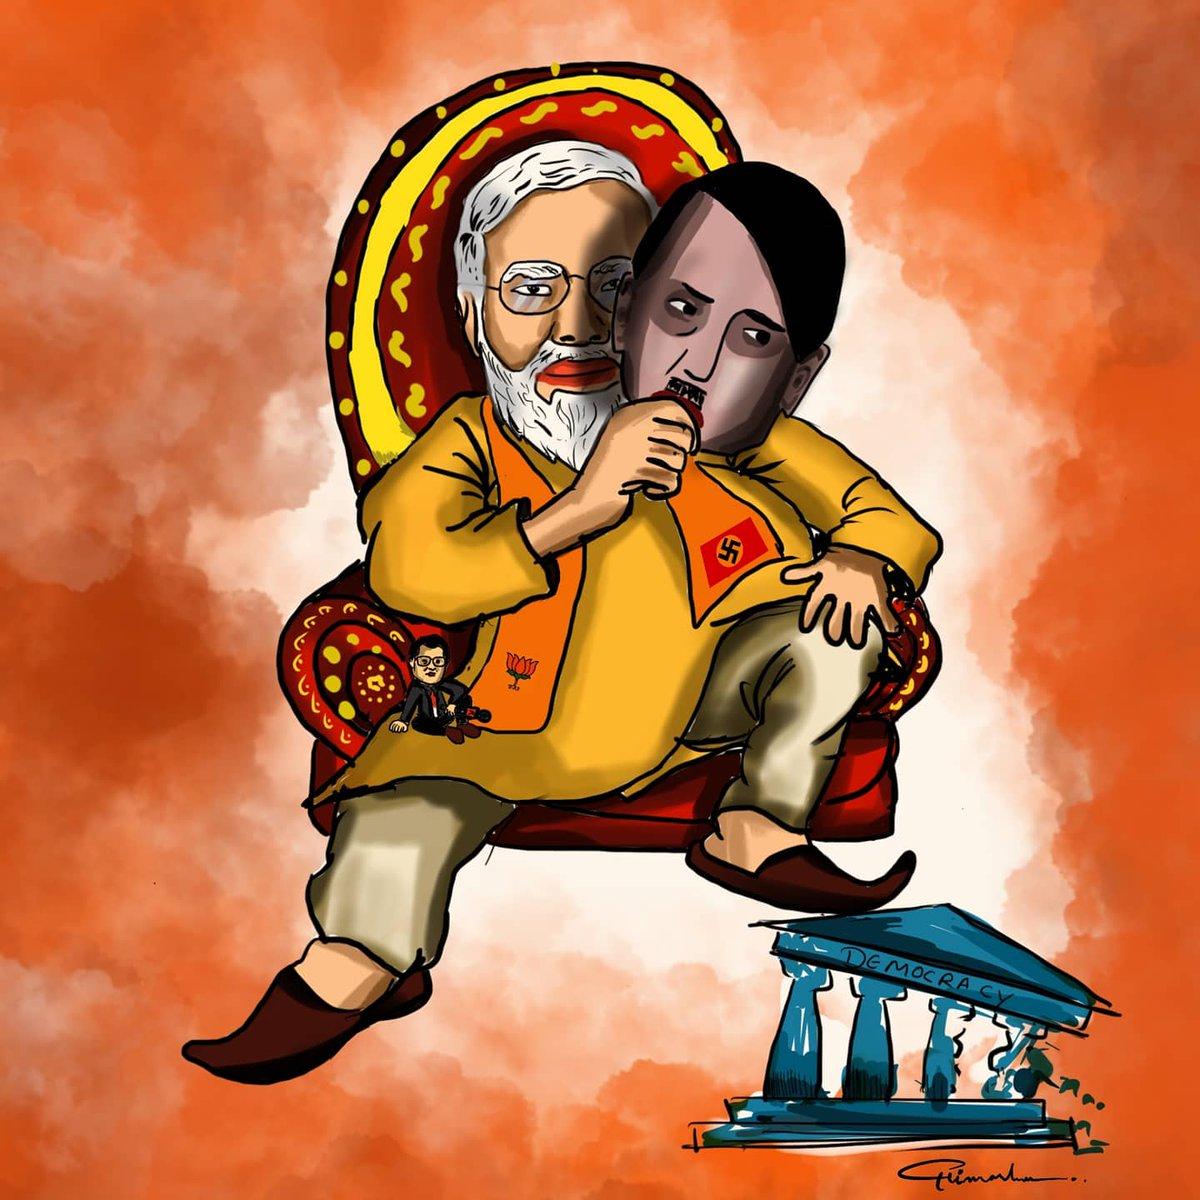 My little illustration about our dictator @Troll_Modi @Kisanektamorcha @TheDeshBhakt @satishacharya @kunalkamra88 #26JanDelhiChalo #JaiJawanJaiKissan #TractorRally